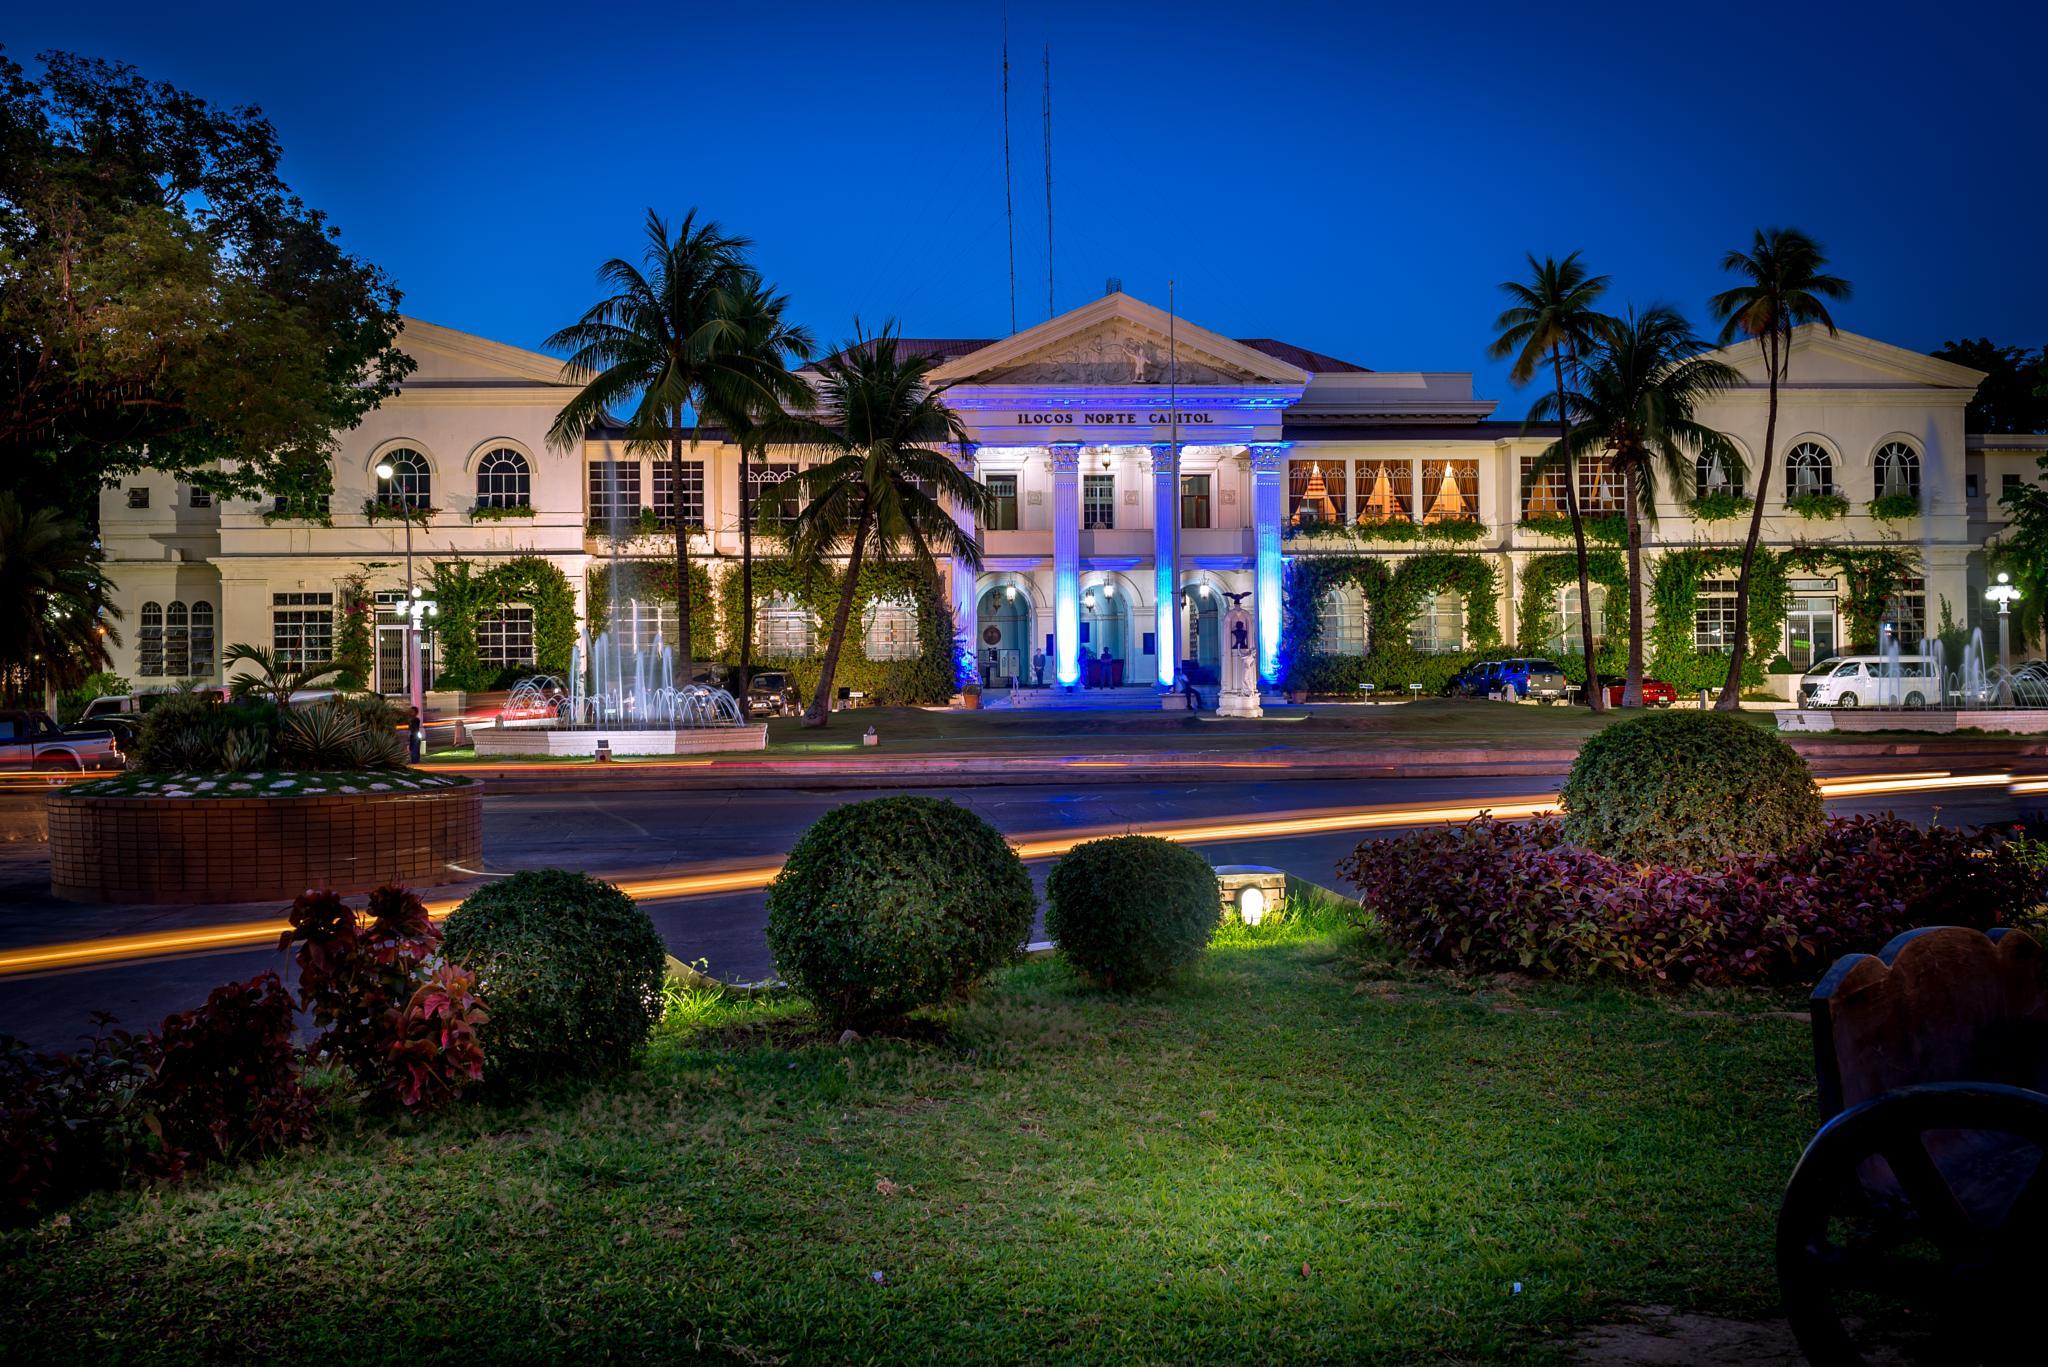 Ilocos Norte Capitol by LakayRudi